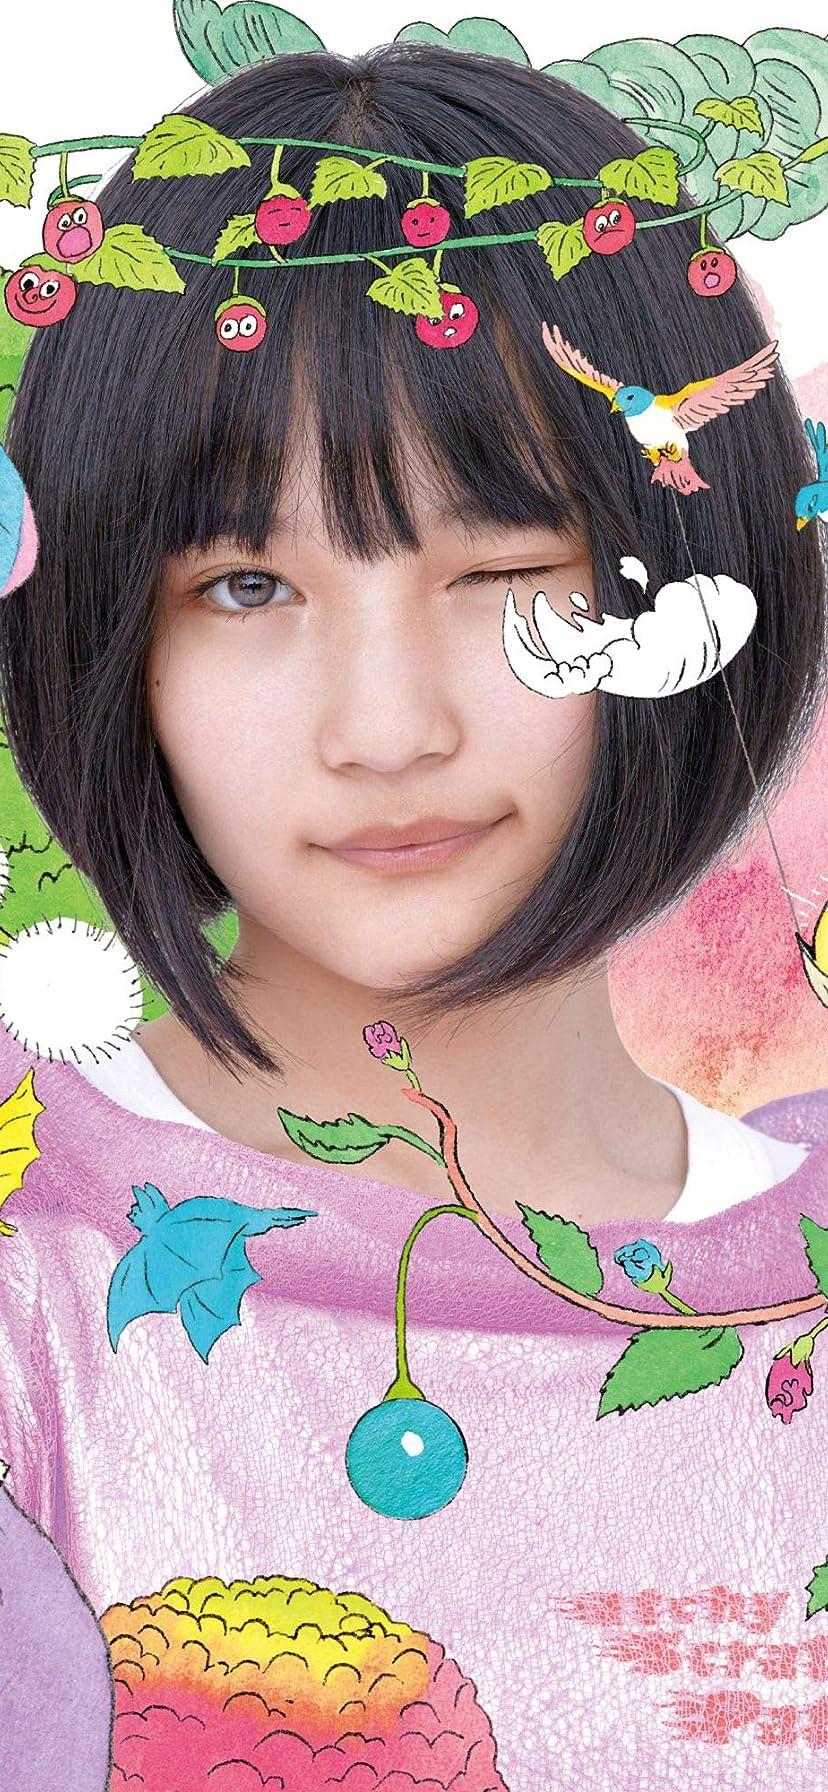 Akb48 Iphone 11 Pro Max Xr Xs Max 壁紙 矢作萌夏 女性タレント スマホ用画像140632